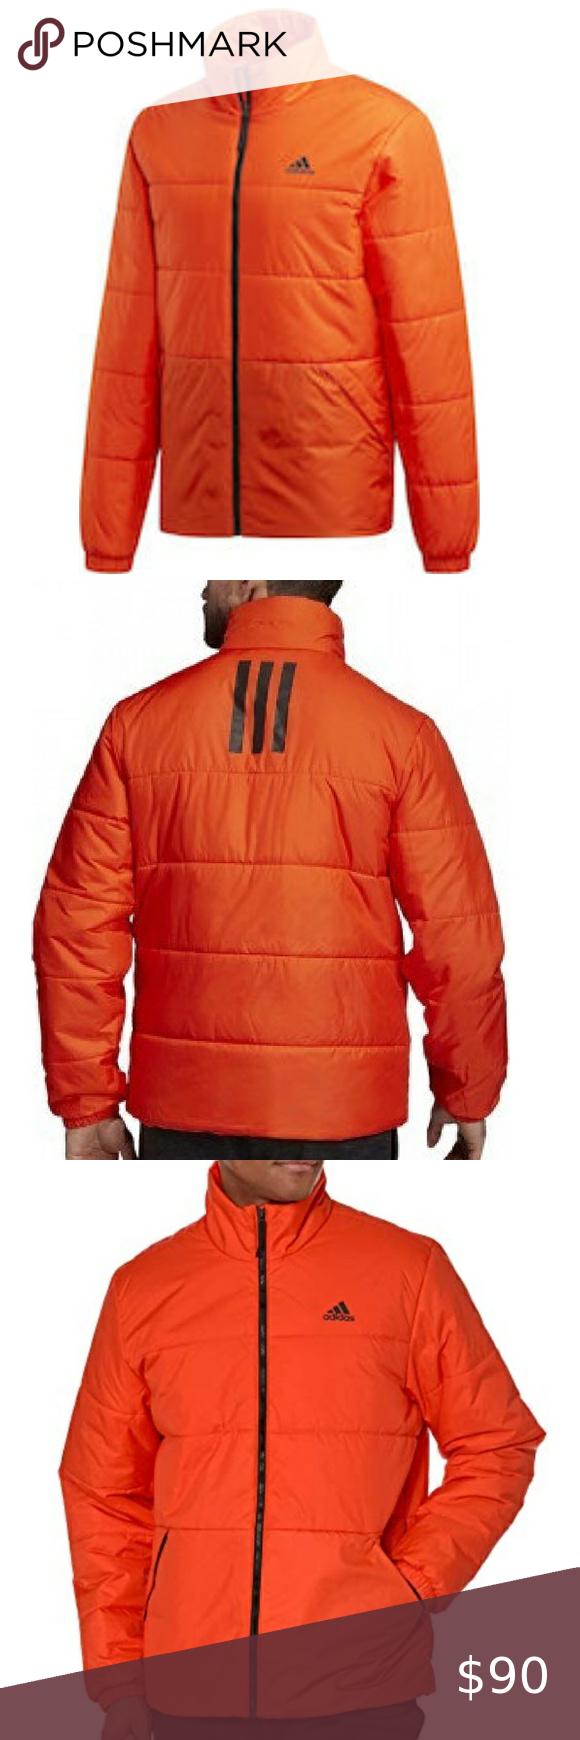 New Adidas Men S Puffer Jacket Adidas Men Mens Puffer Jacket New Adidas [ 1740 x 580 Pixel ]